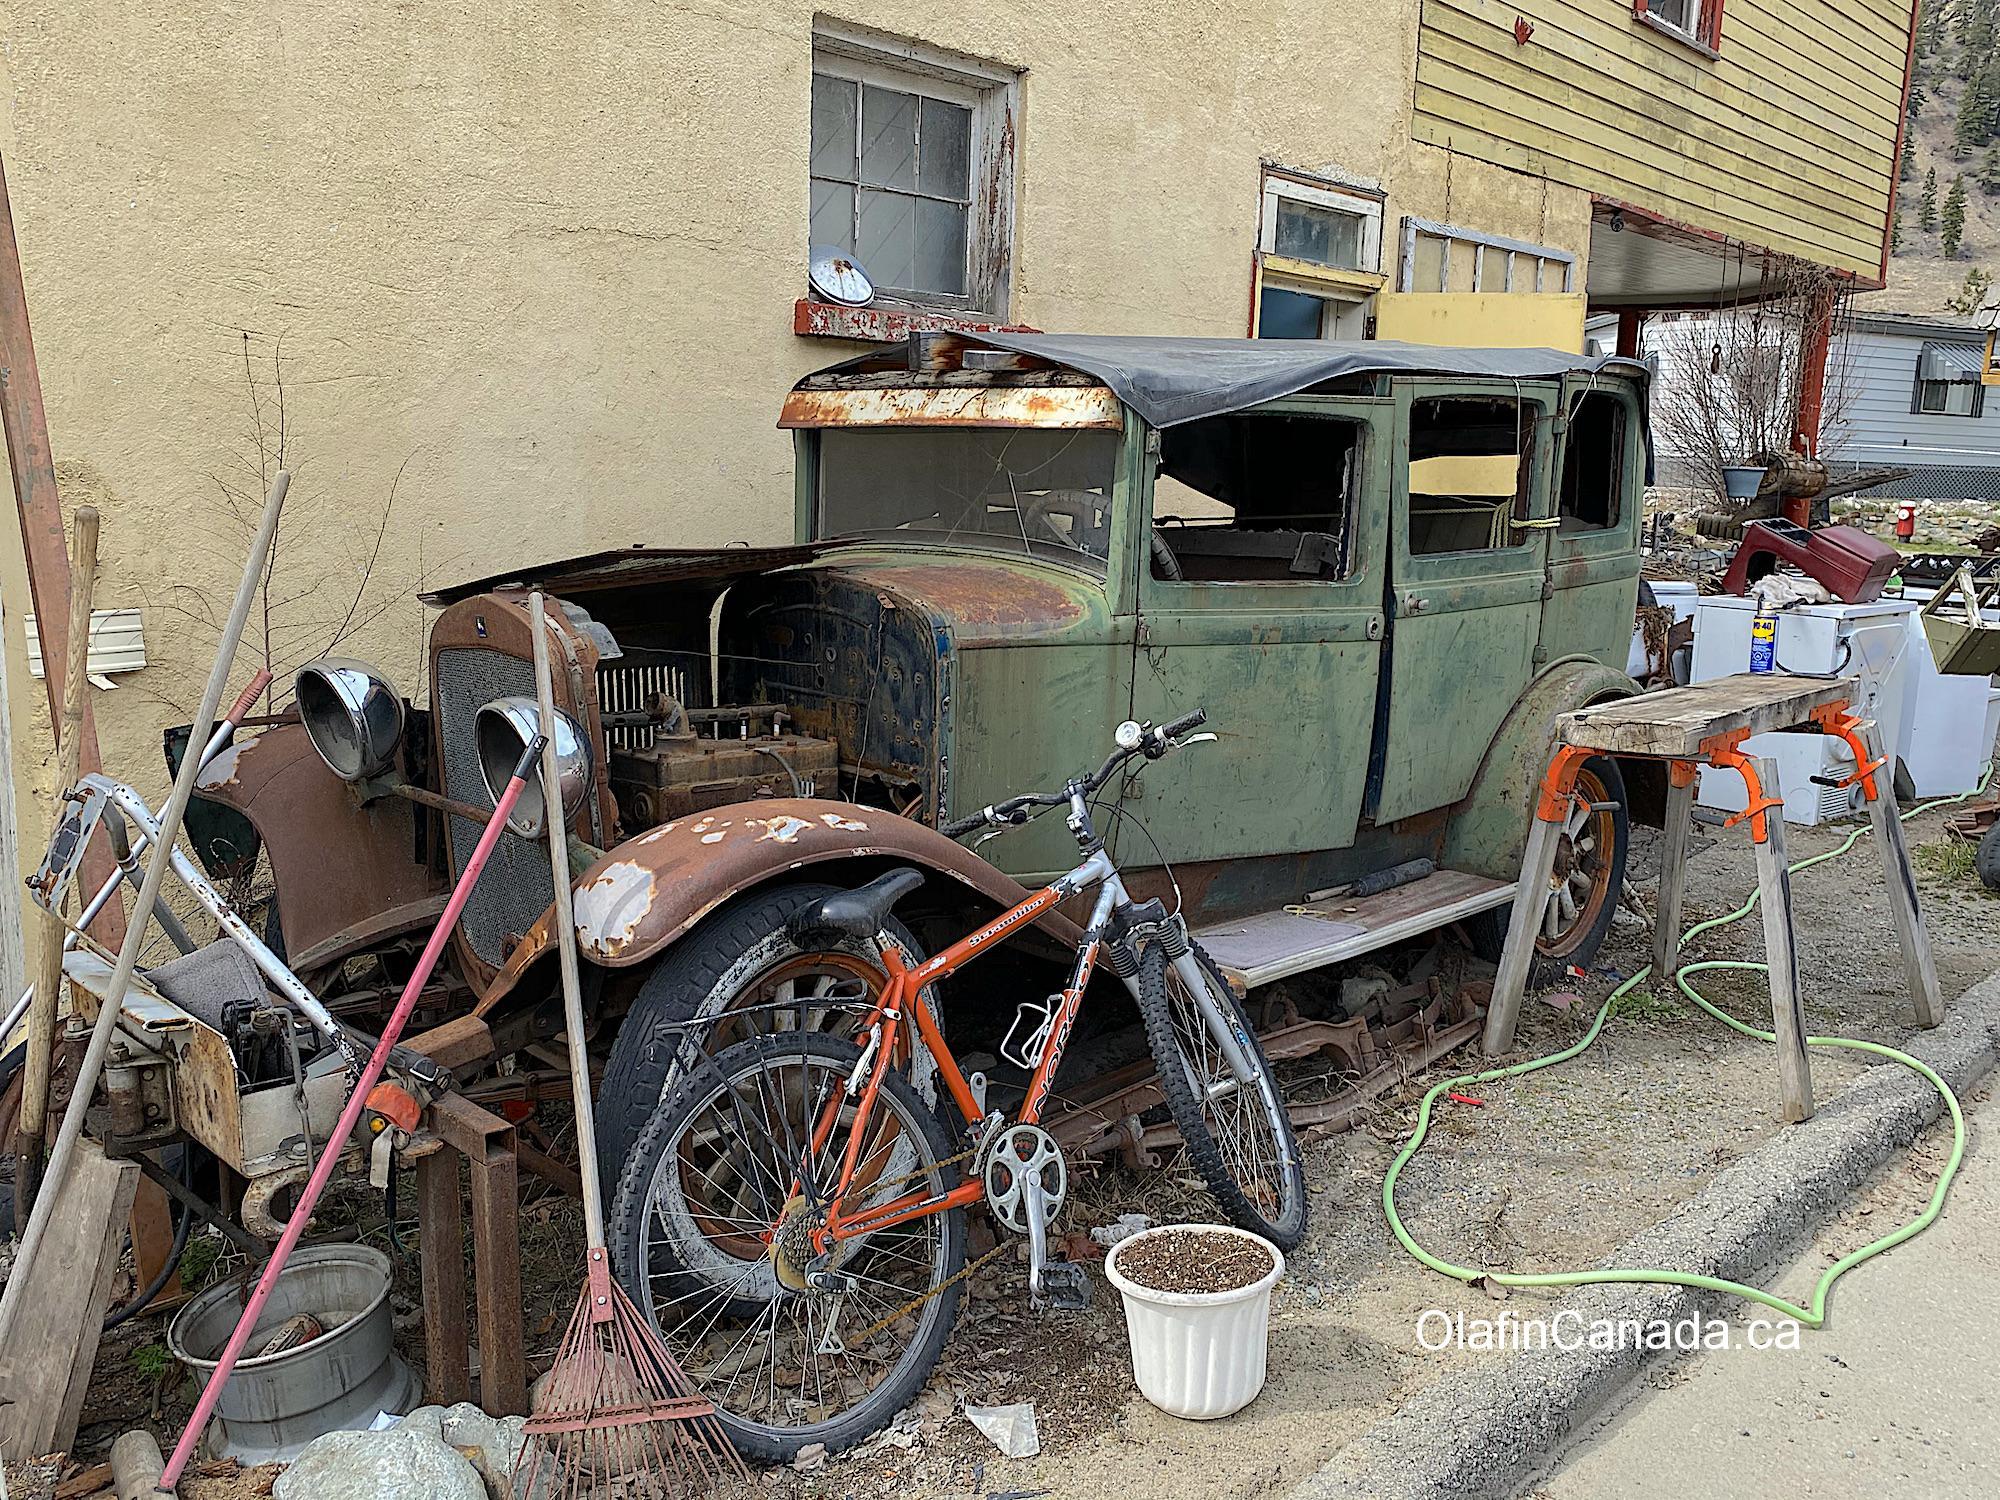 Abandoned car in Hedley #olafincanada #britishcolumbia #discoverbc #abandonedbc #hedley #car